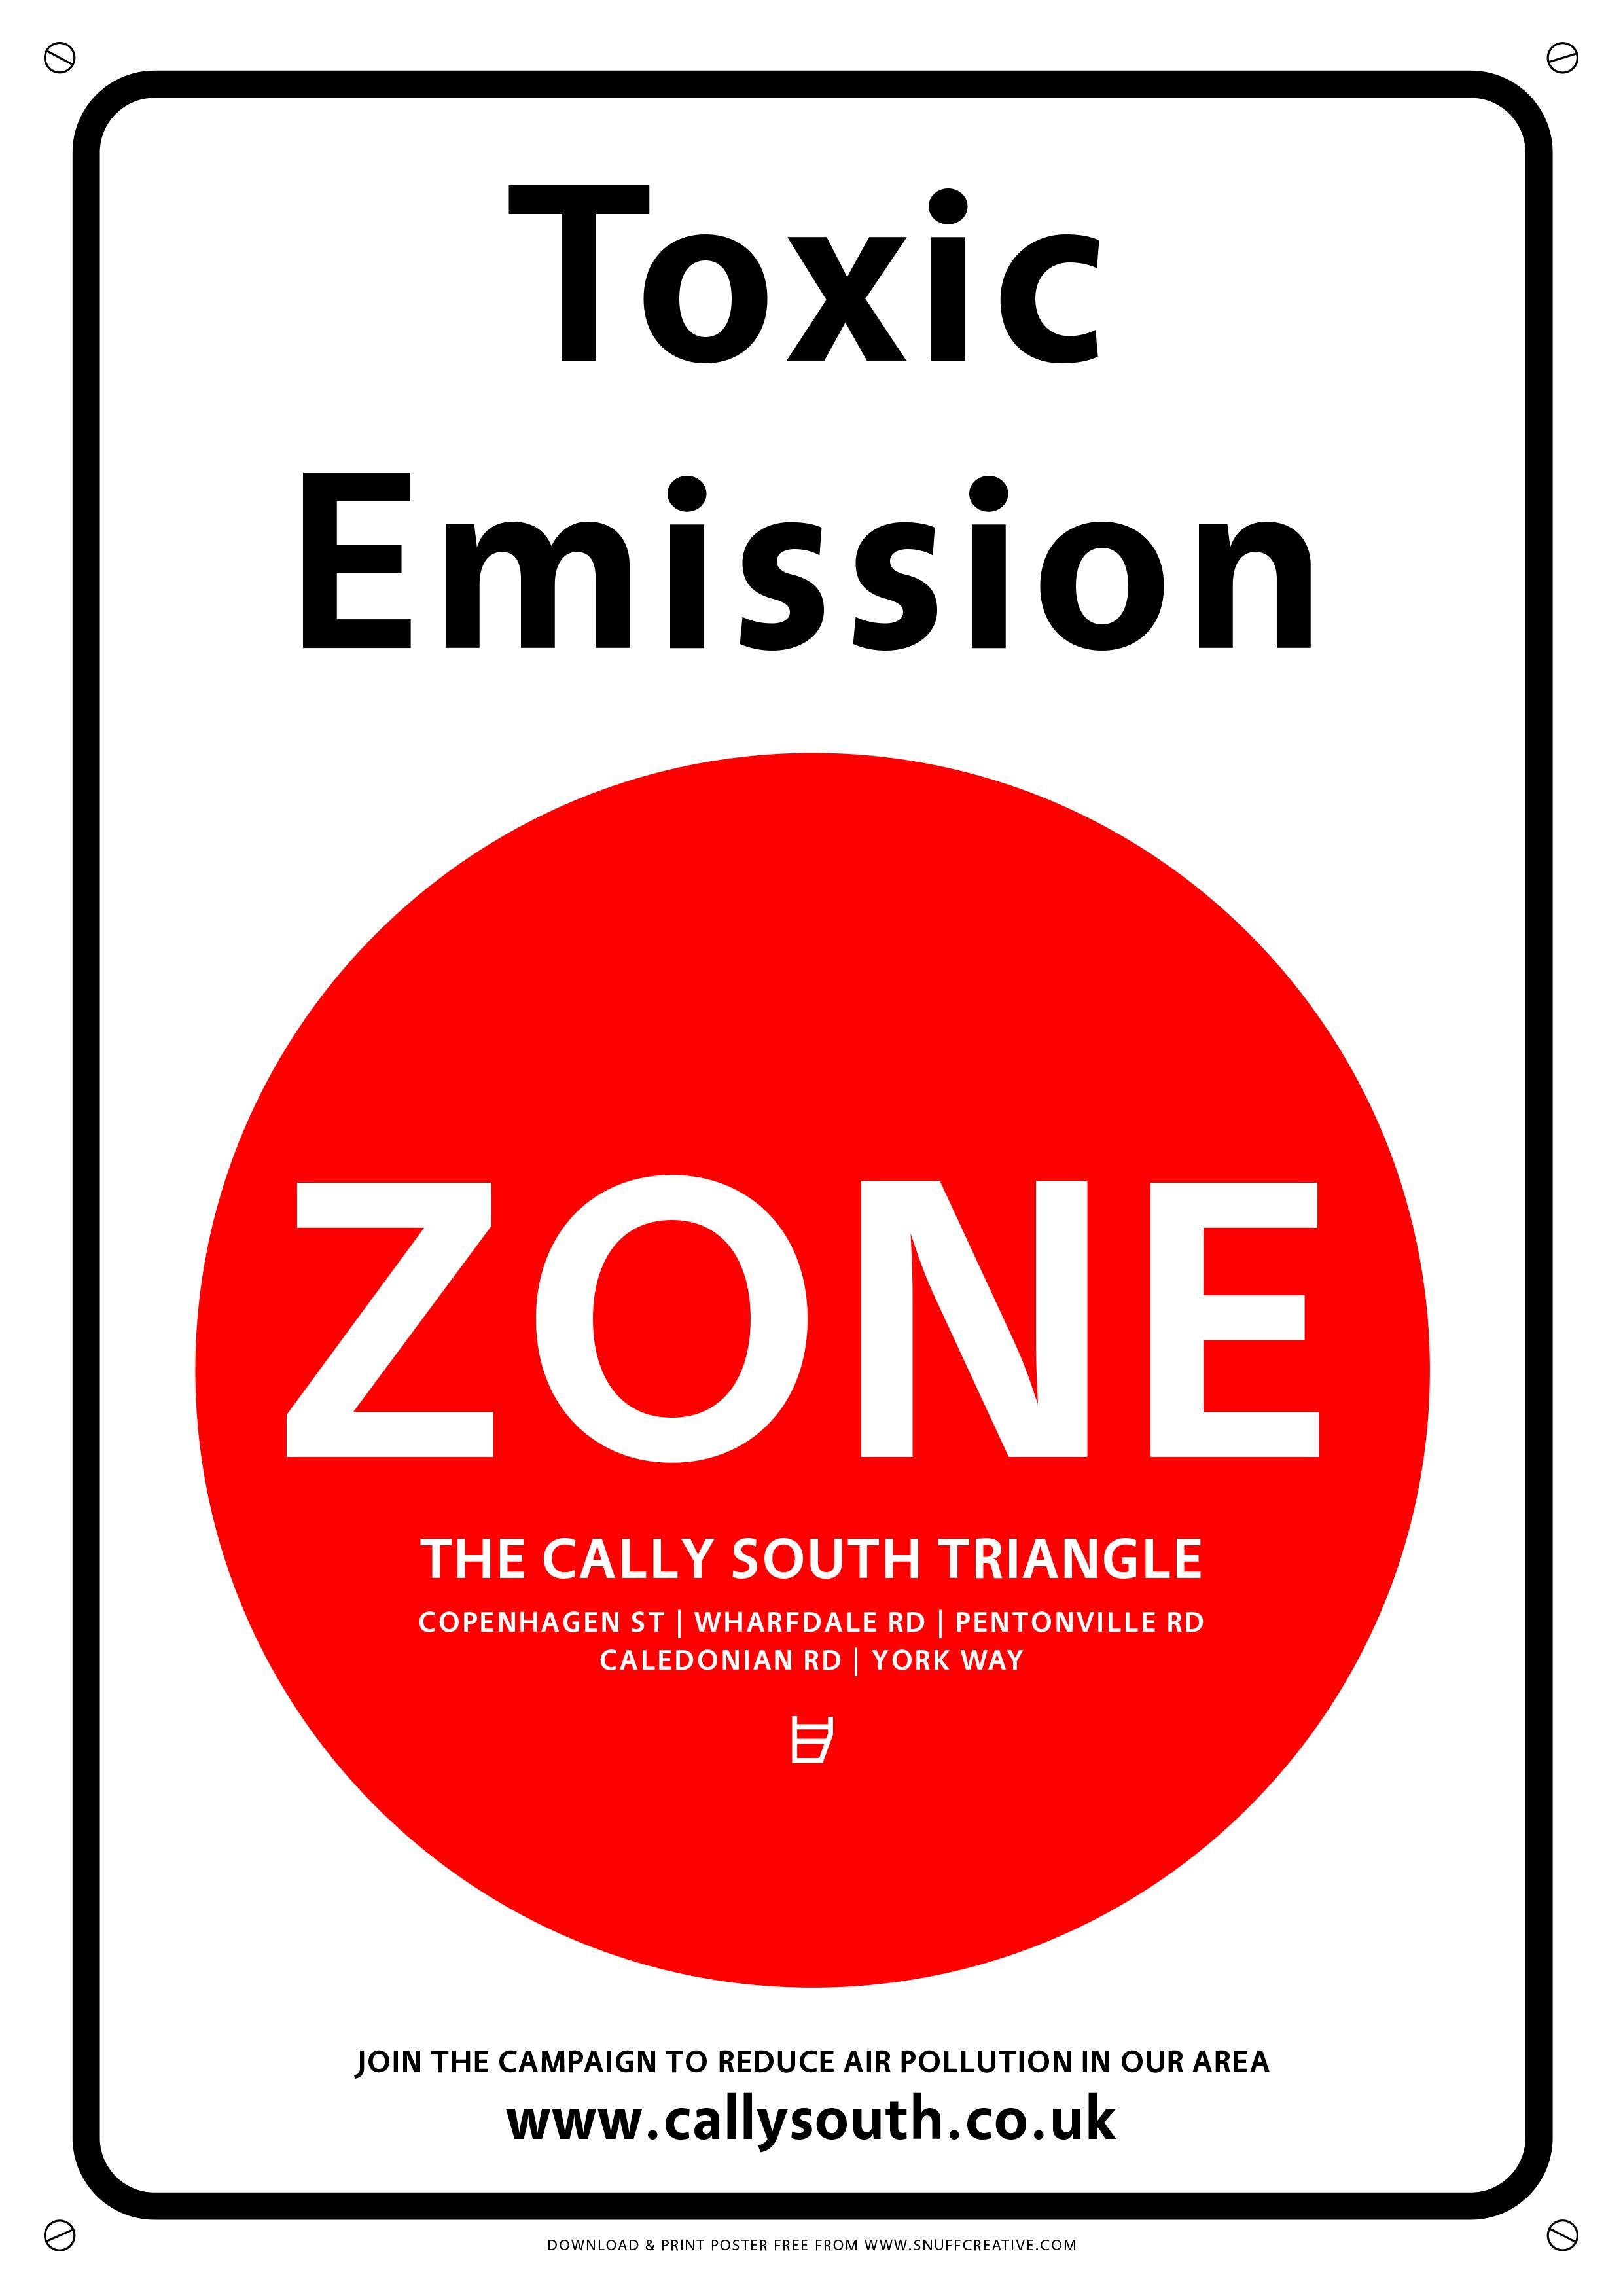 TOXIC EMISSION ZONE-signagePOSTERS.jpg